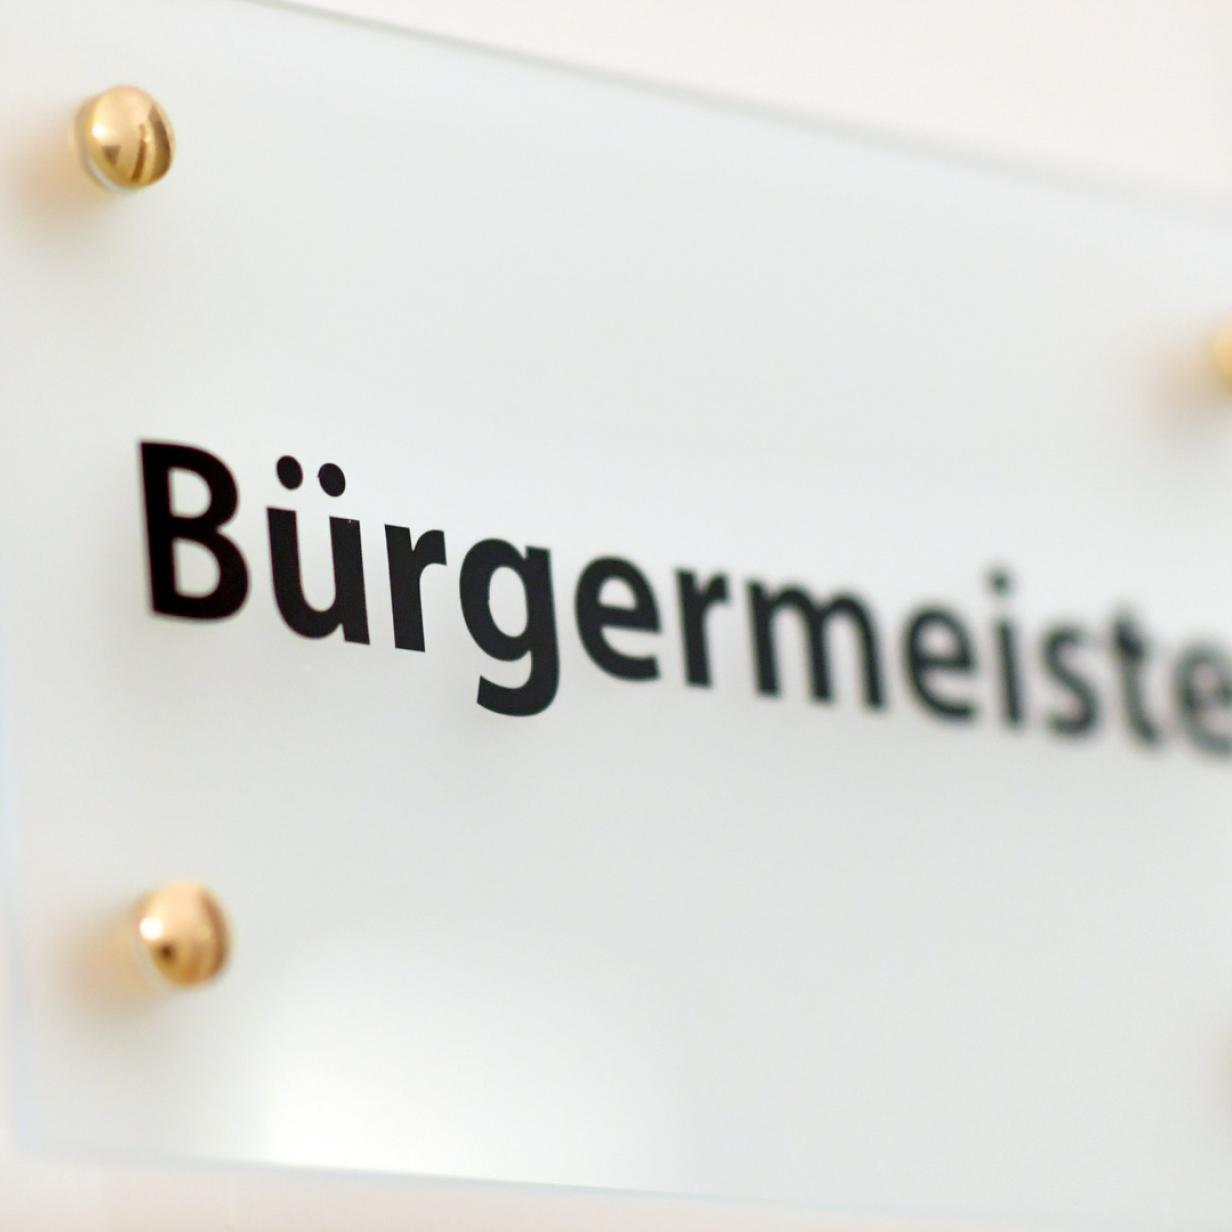 Deutsch-wagram partnersuche kreis: Eggersdorf bei graz